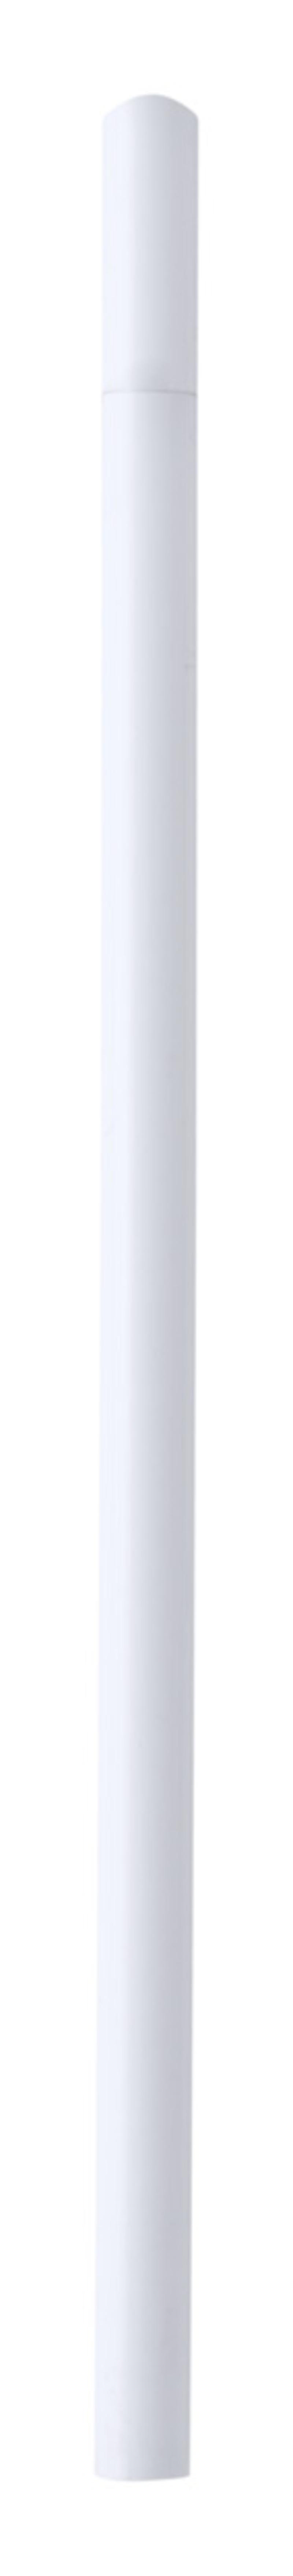 Koby pencil